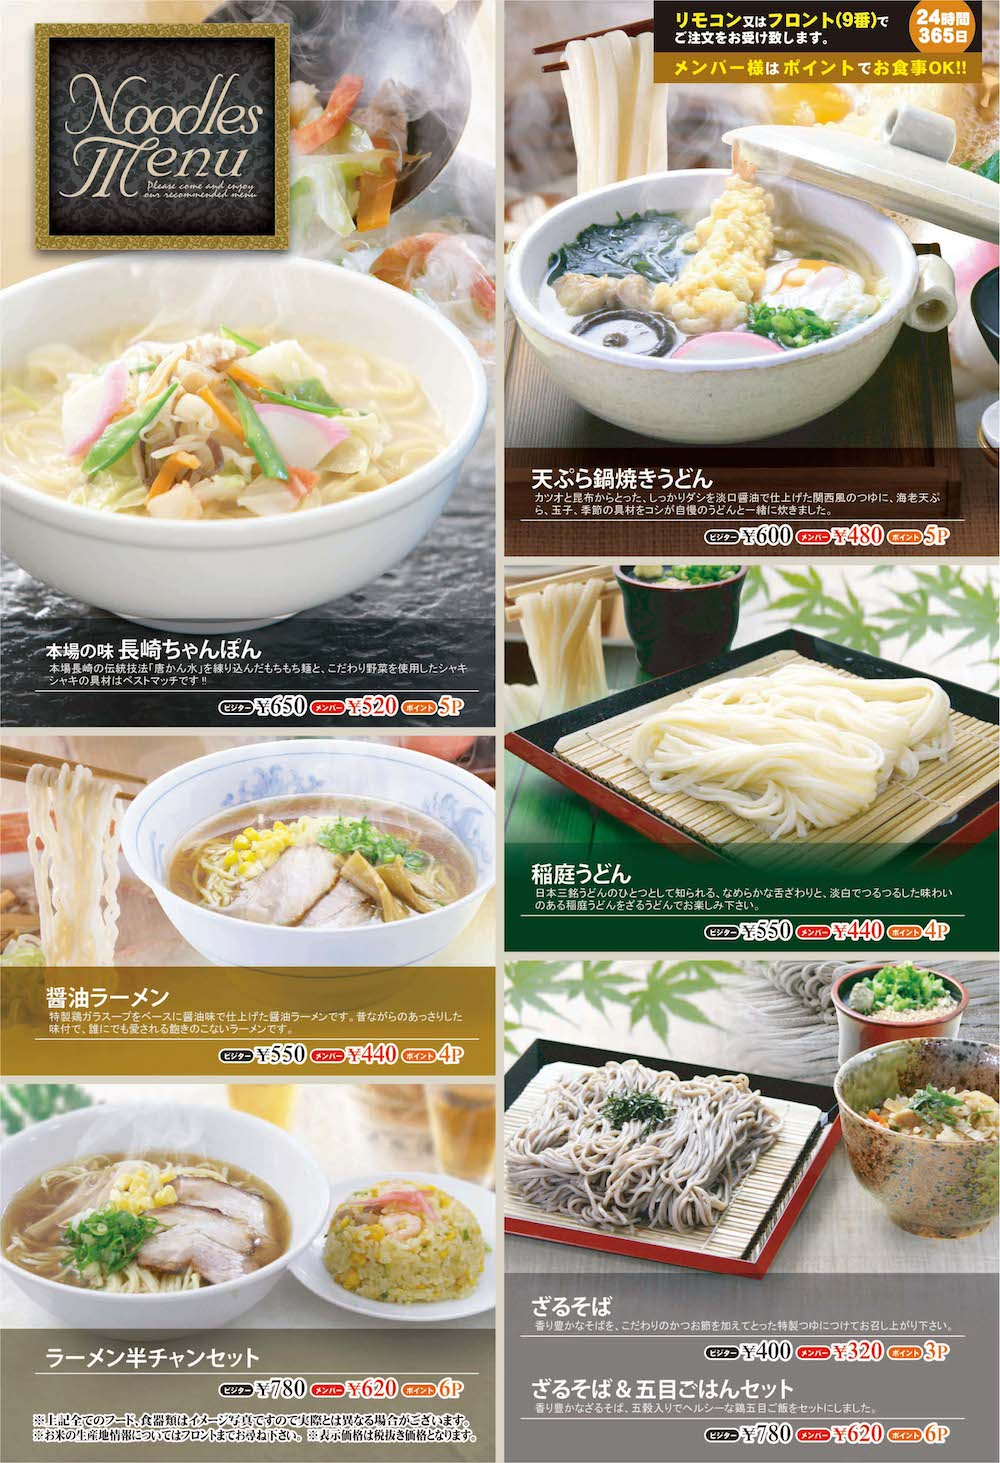 Noodles menu